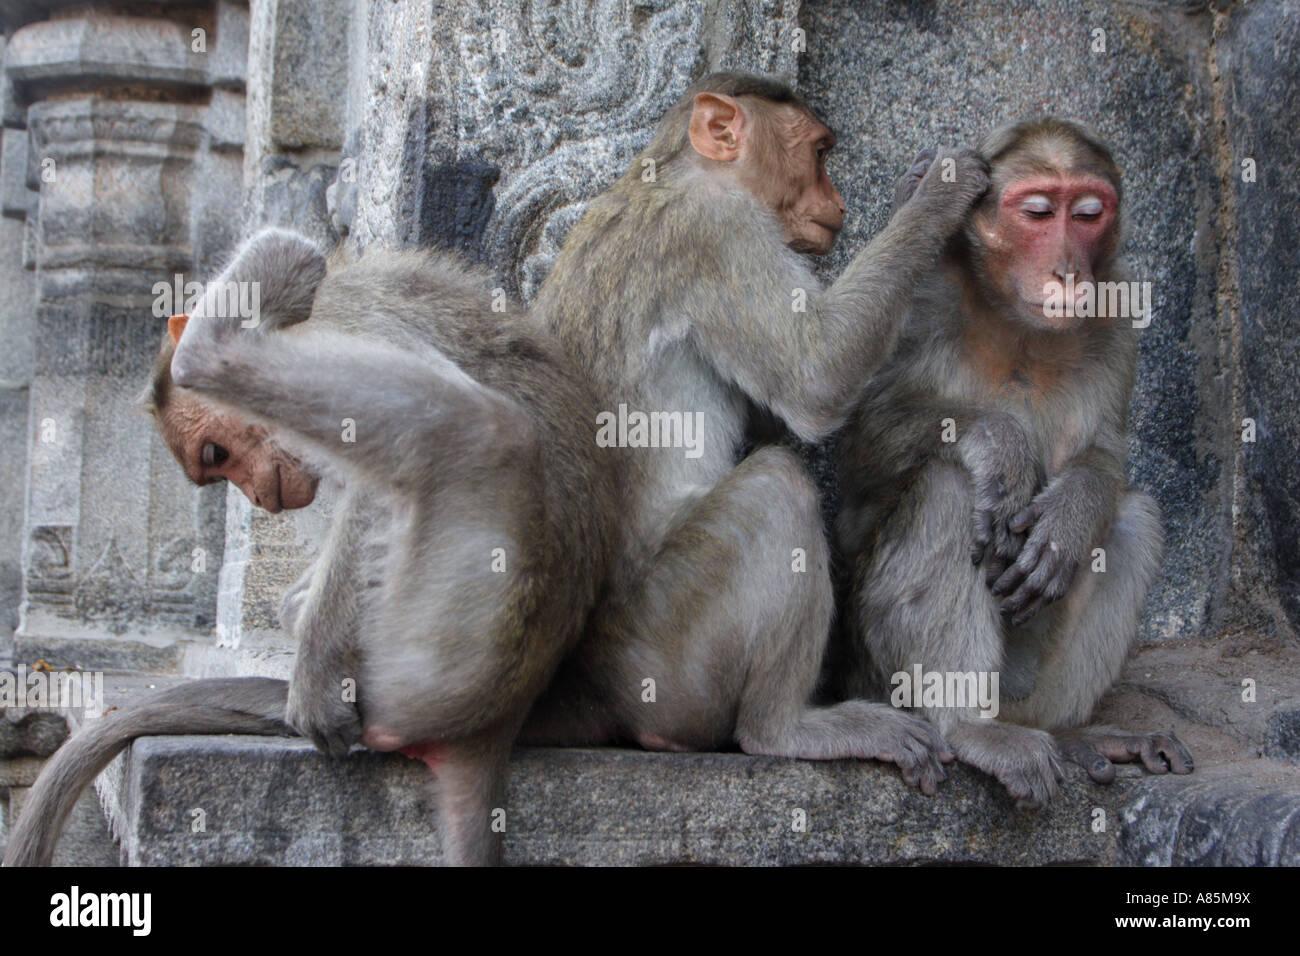 Three bonnet macaques preening within the Arunachalaeshvara Temple complex in Tiruvannamalai, Tamil Nadu, India. - Stock Image